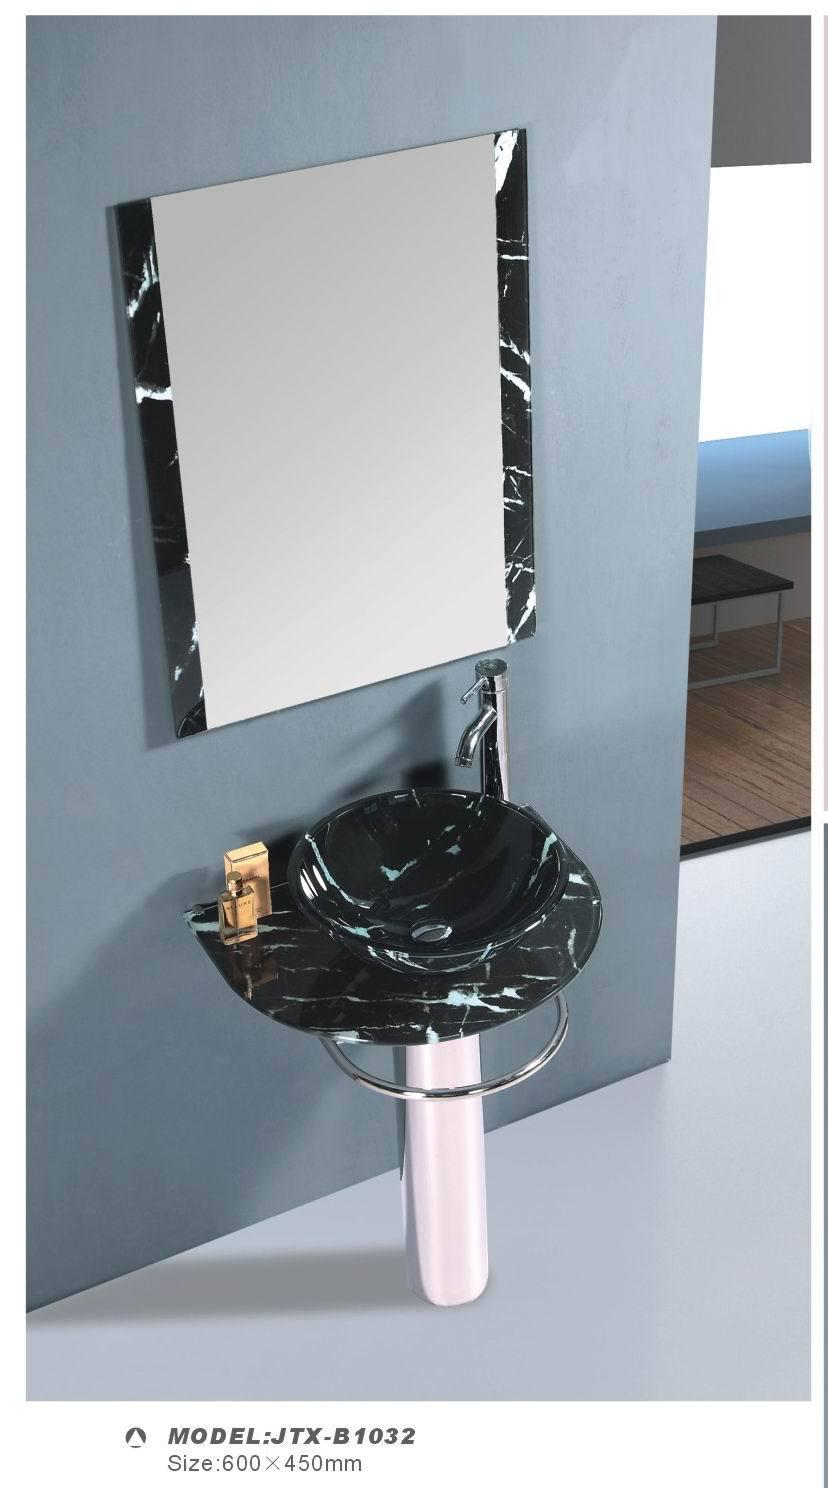 Wash basin mirror price images for Wash basin mirror price